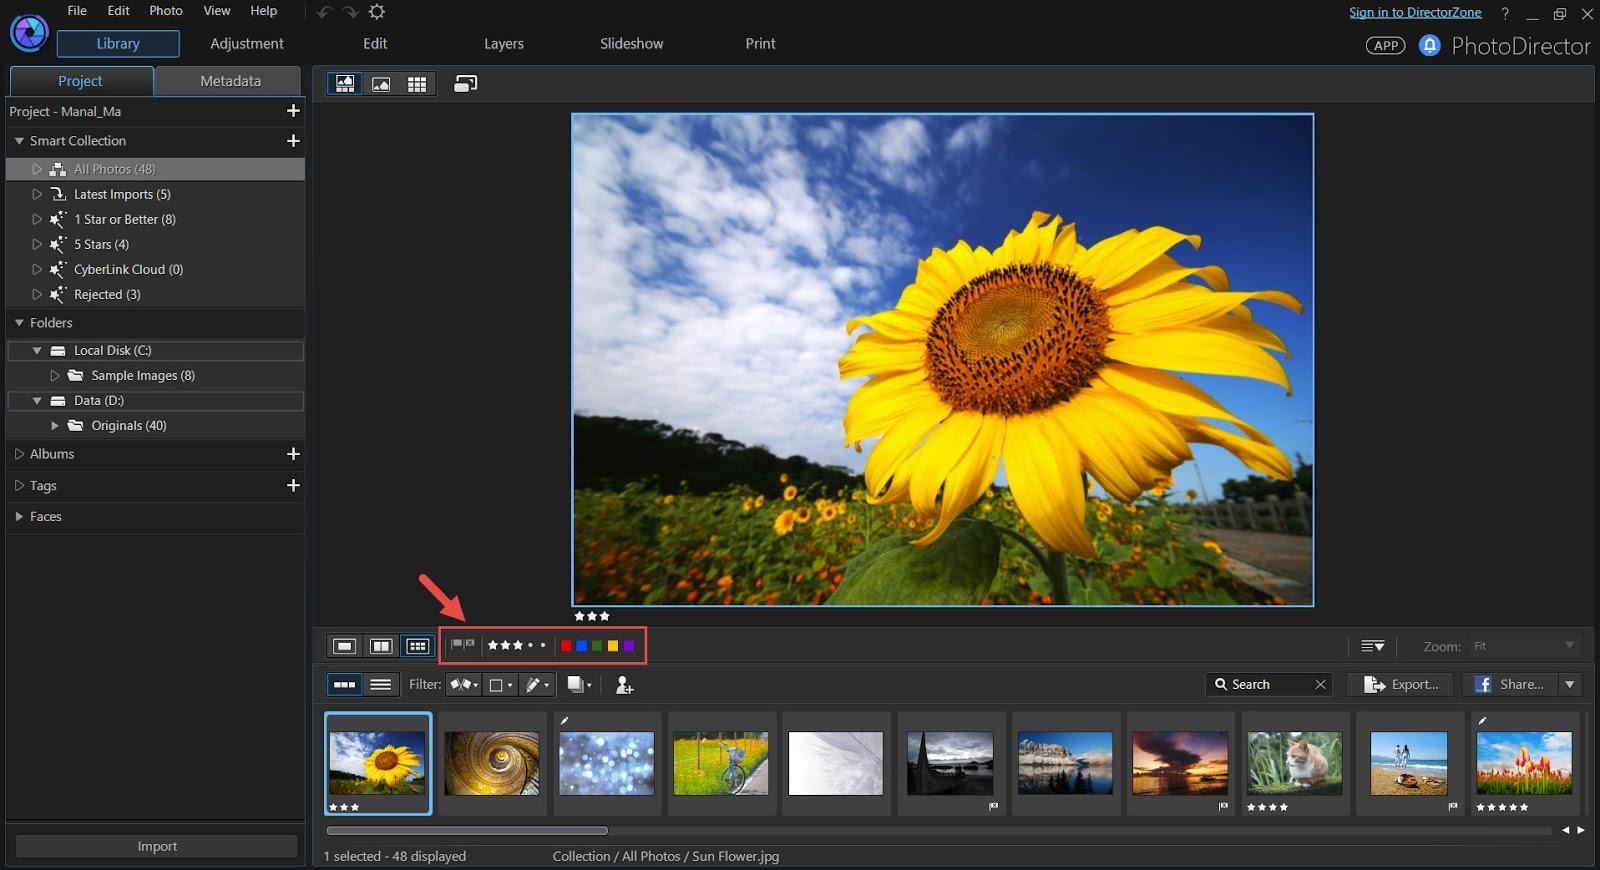 cyberlink photodirector 9 tutorial